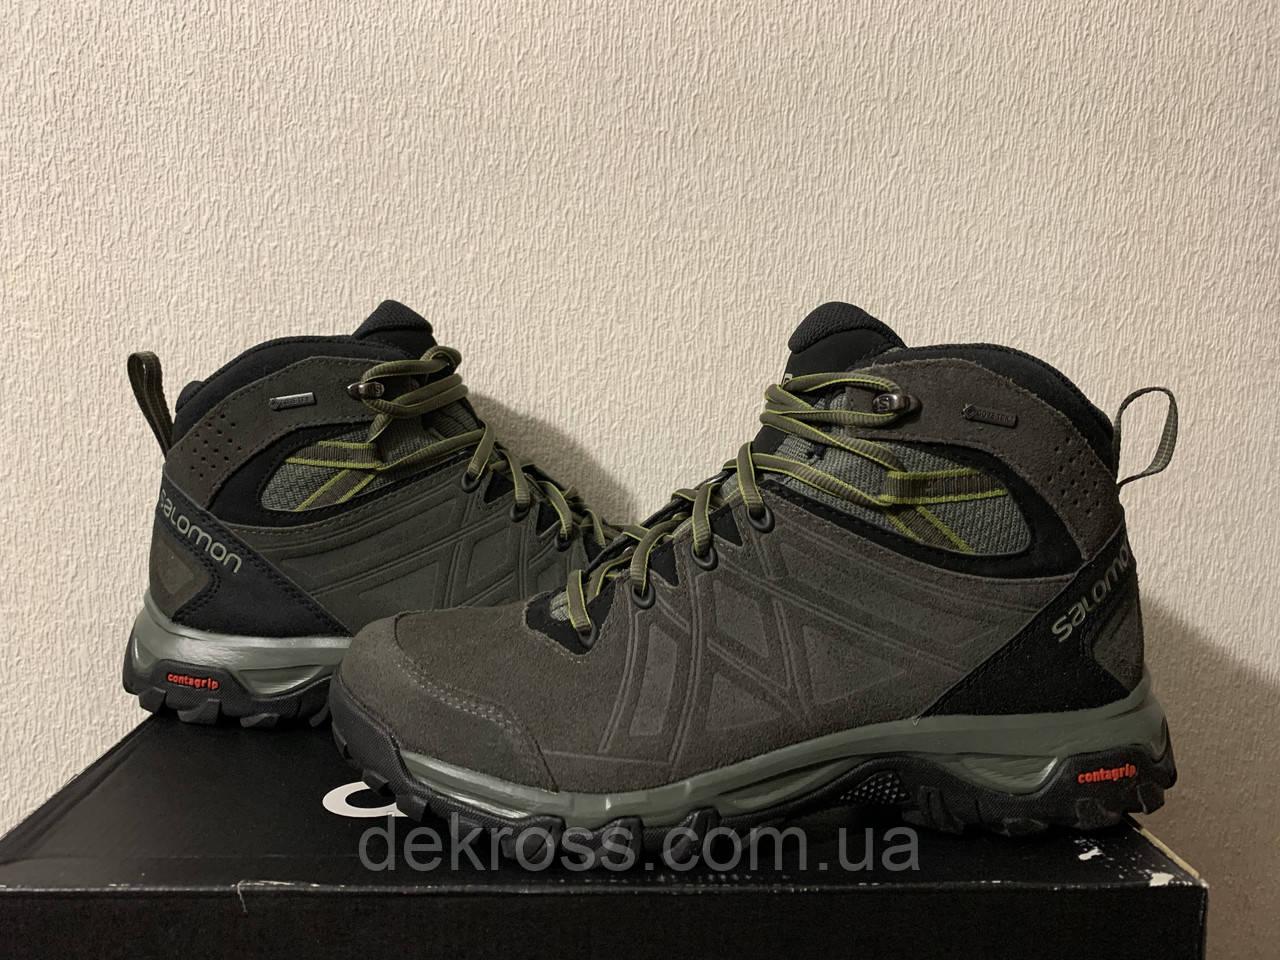 Ботинки Salomon Evasion 2 Mid Ltr Gtx Castor Gra Оригинал 400019